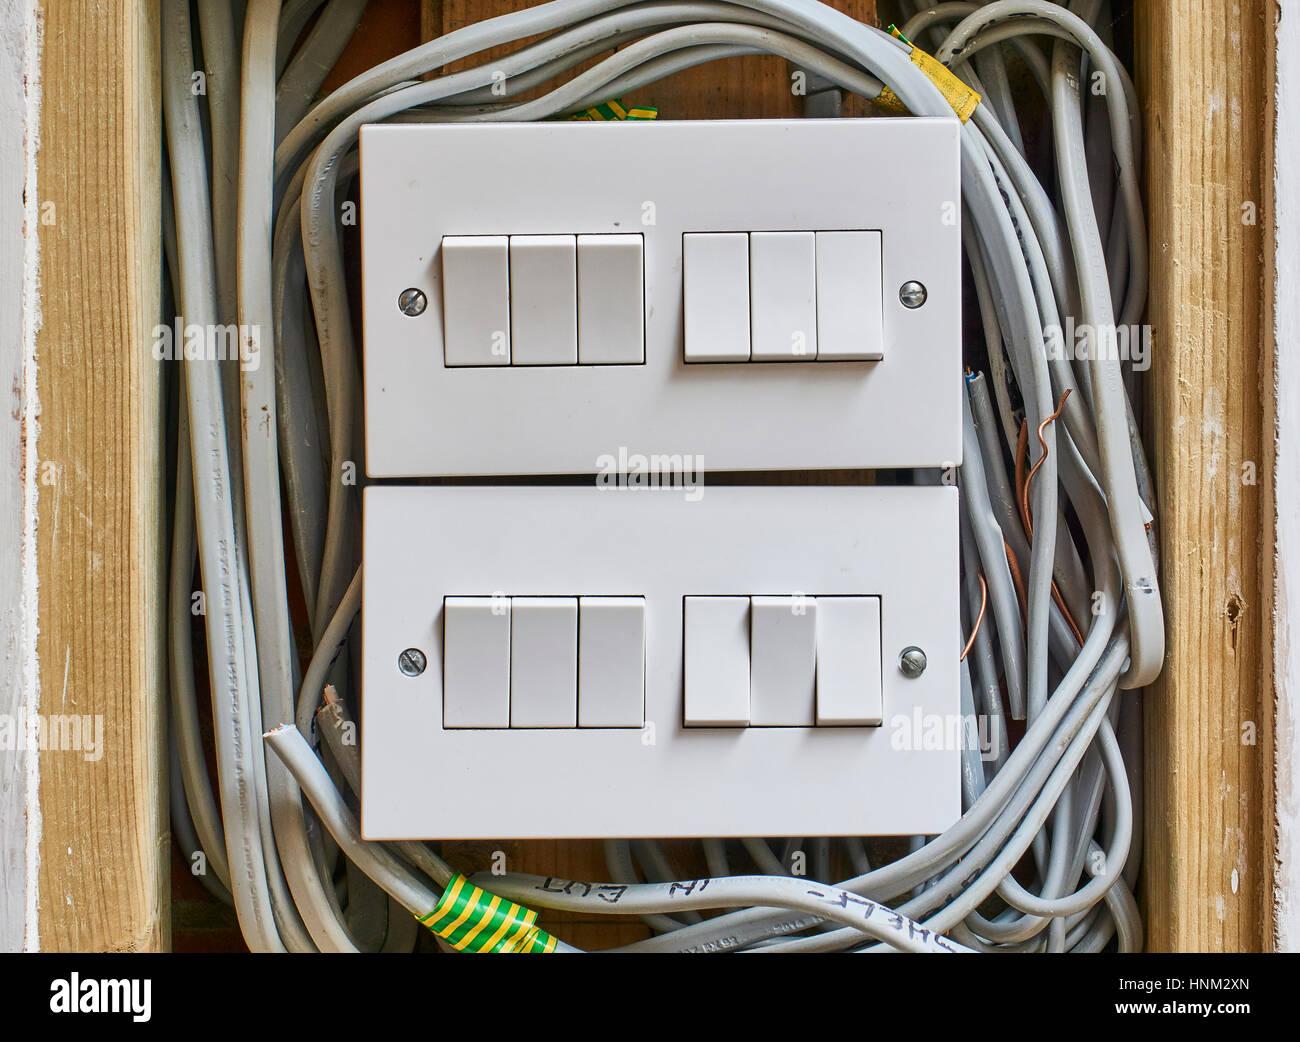 Electric Light Stockfotos & Electric Light Bilder - Alamy